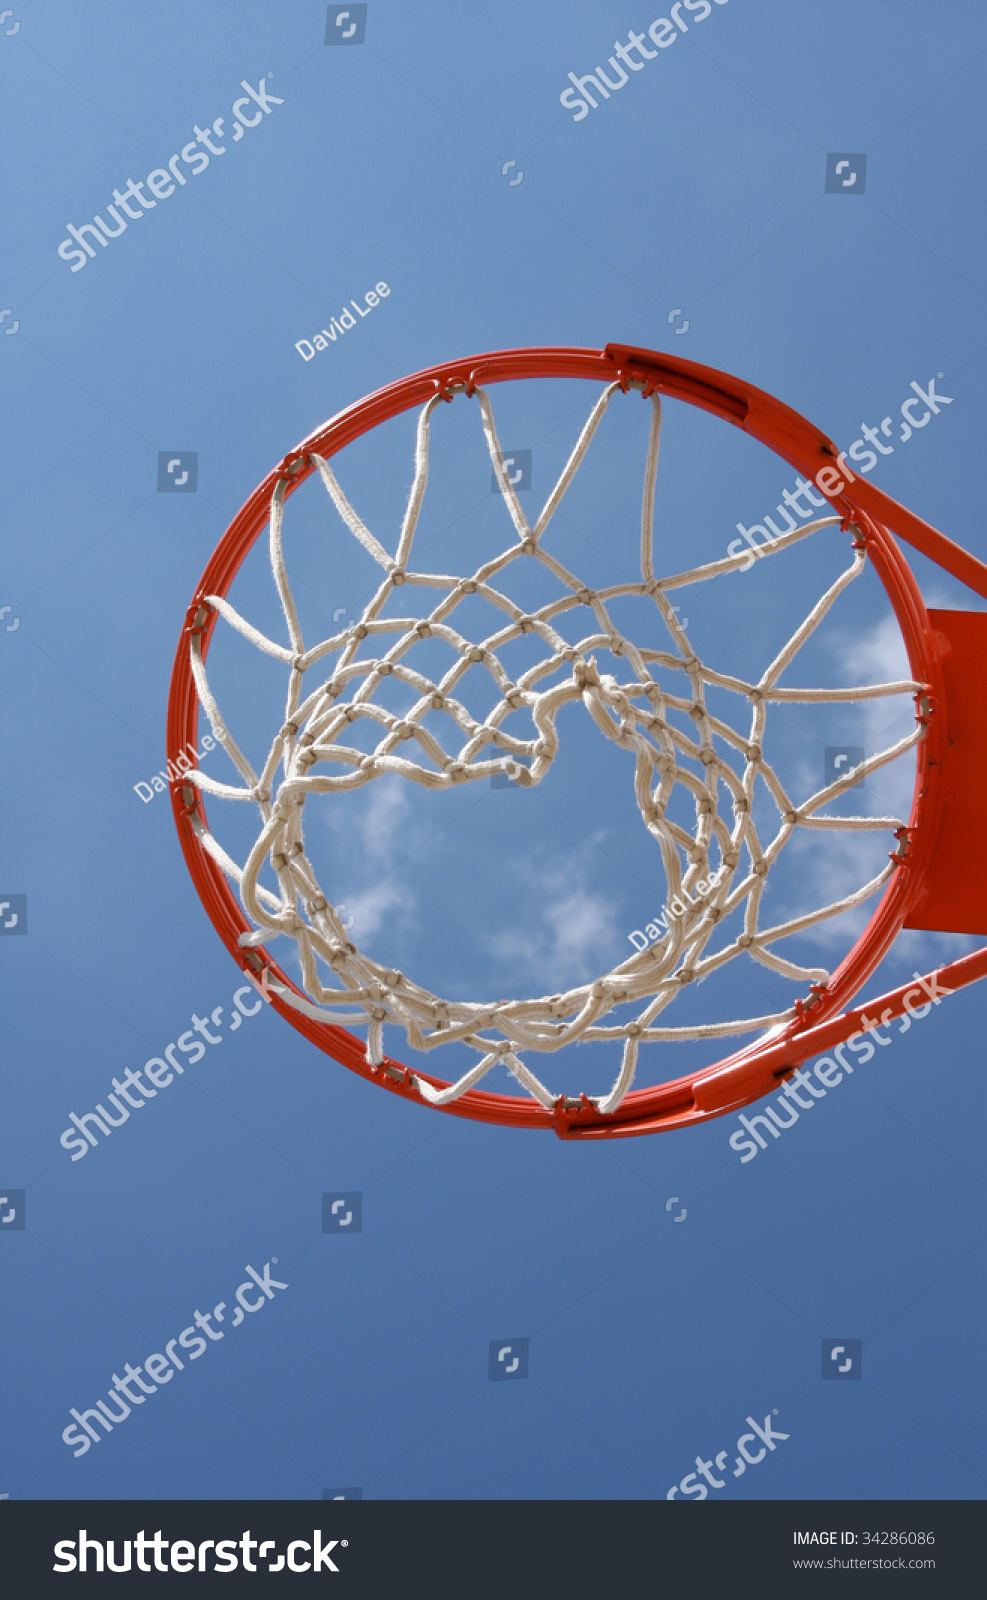 Basketball Hoop Ez Canvas Diagram